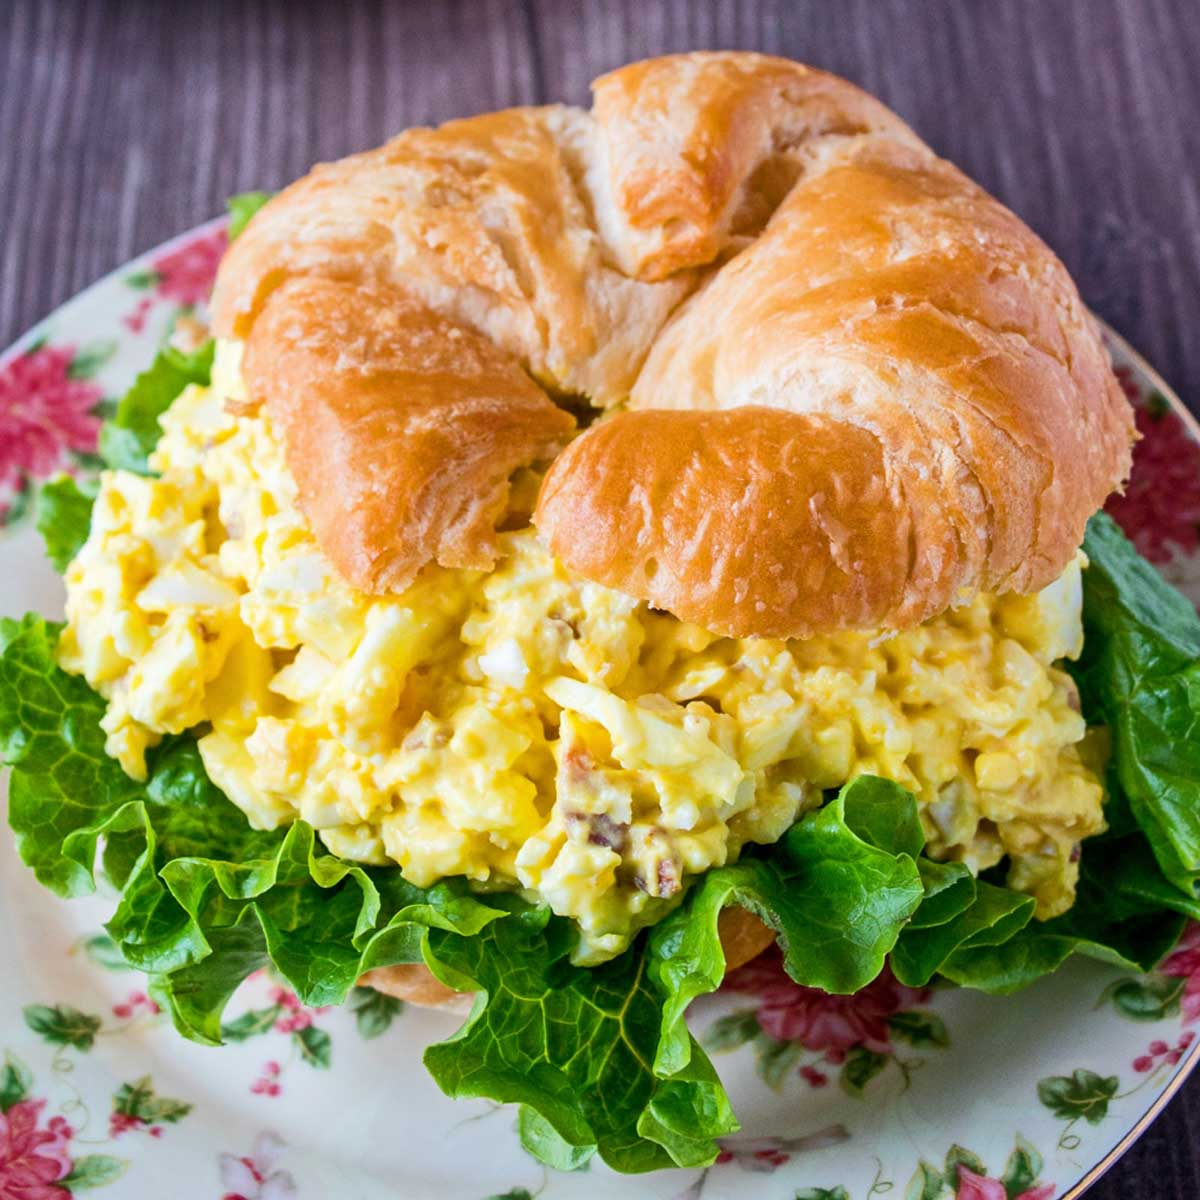 Egg salad sandwich on a floral plate.